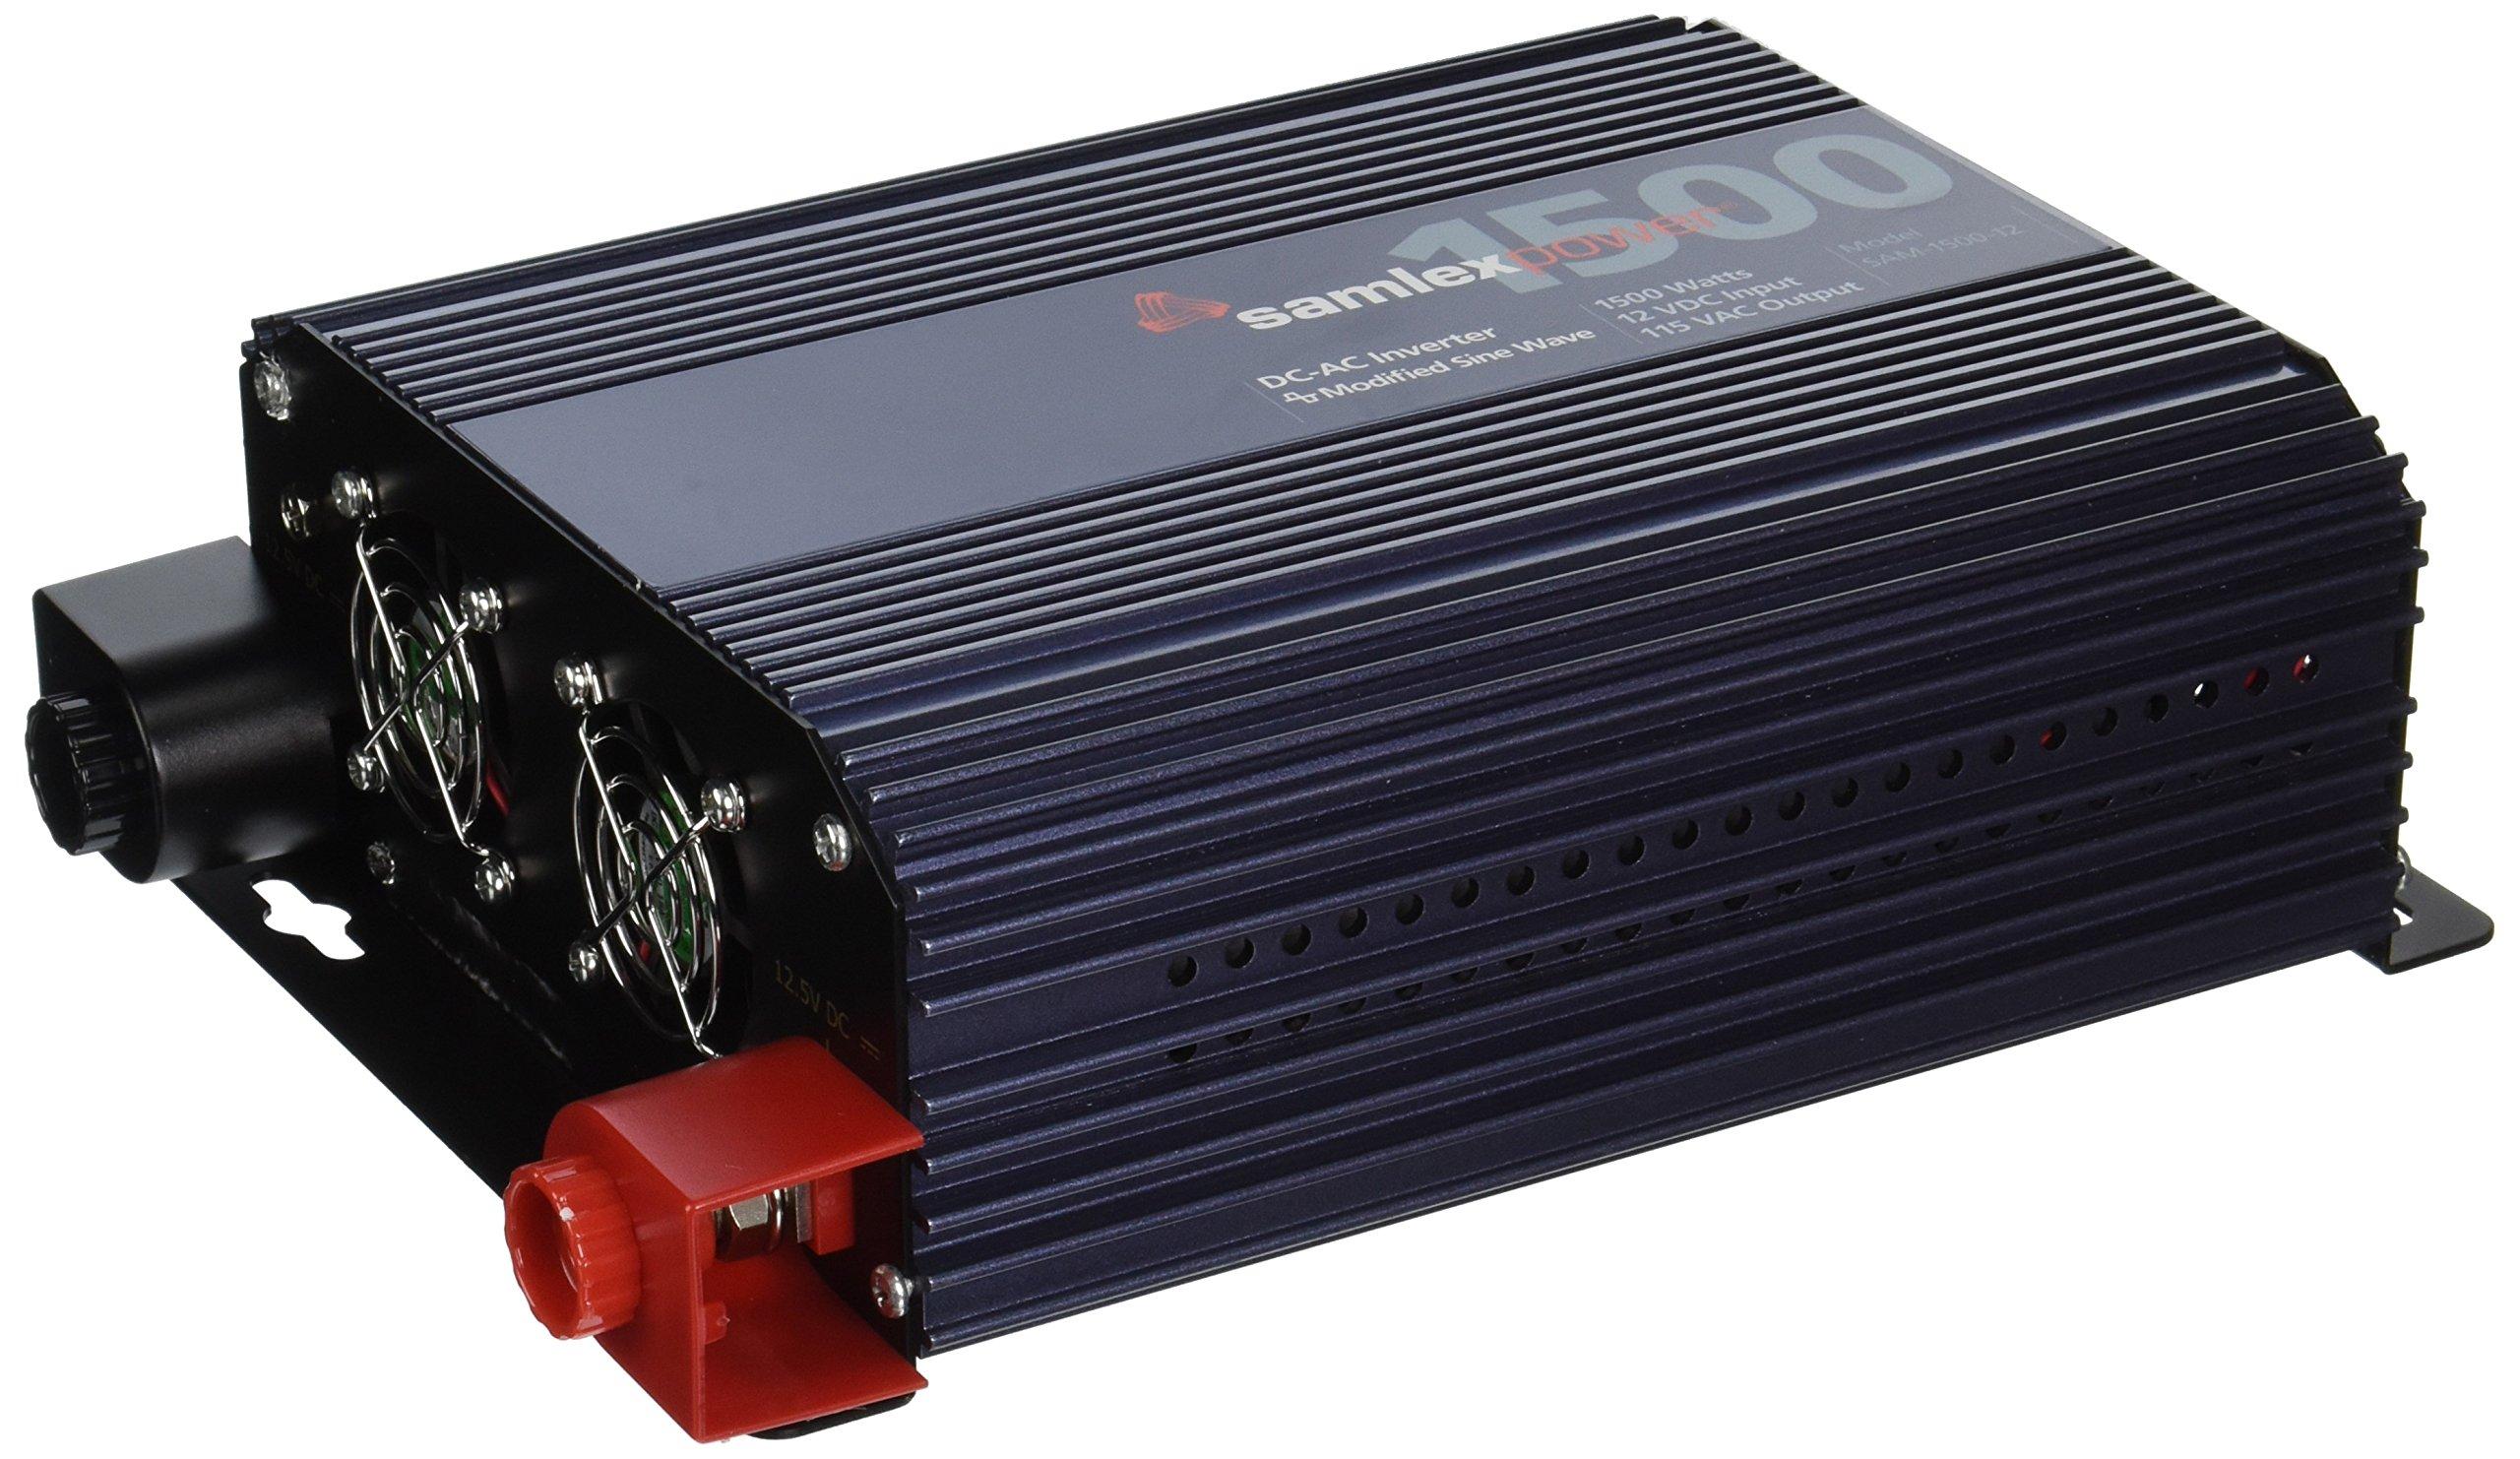 Samlex Solar SAM-1500-12 SAM Series Modified Sine Wave Inverter